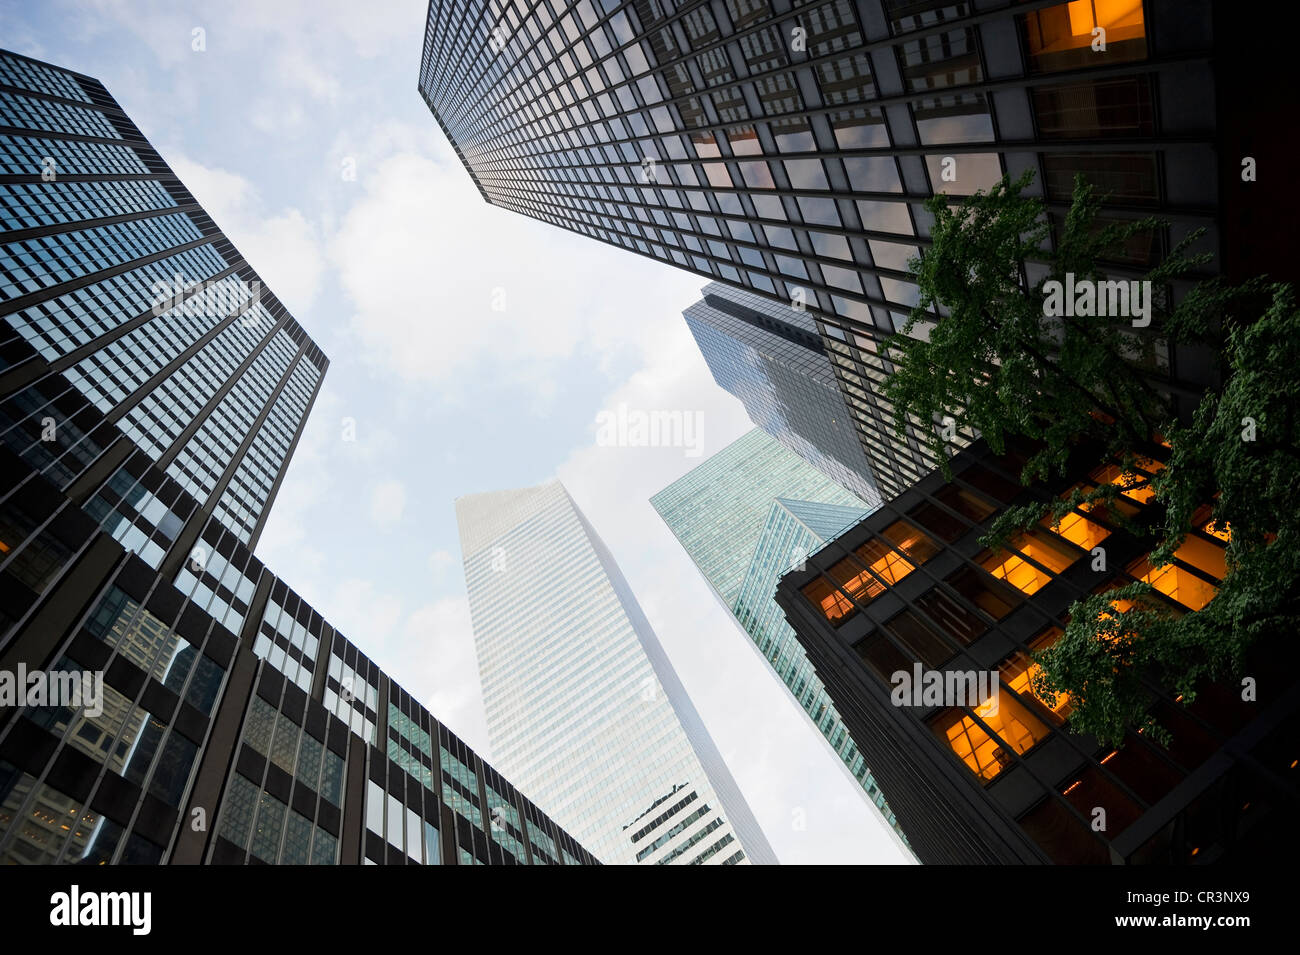 High-rise buildings, Park Avenue, Manhattan, New York, USA, America - Stock Image